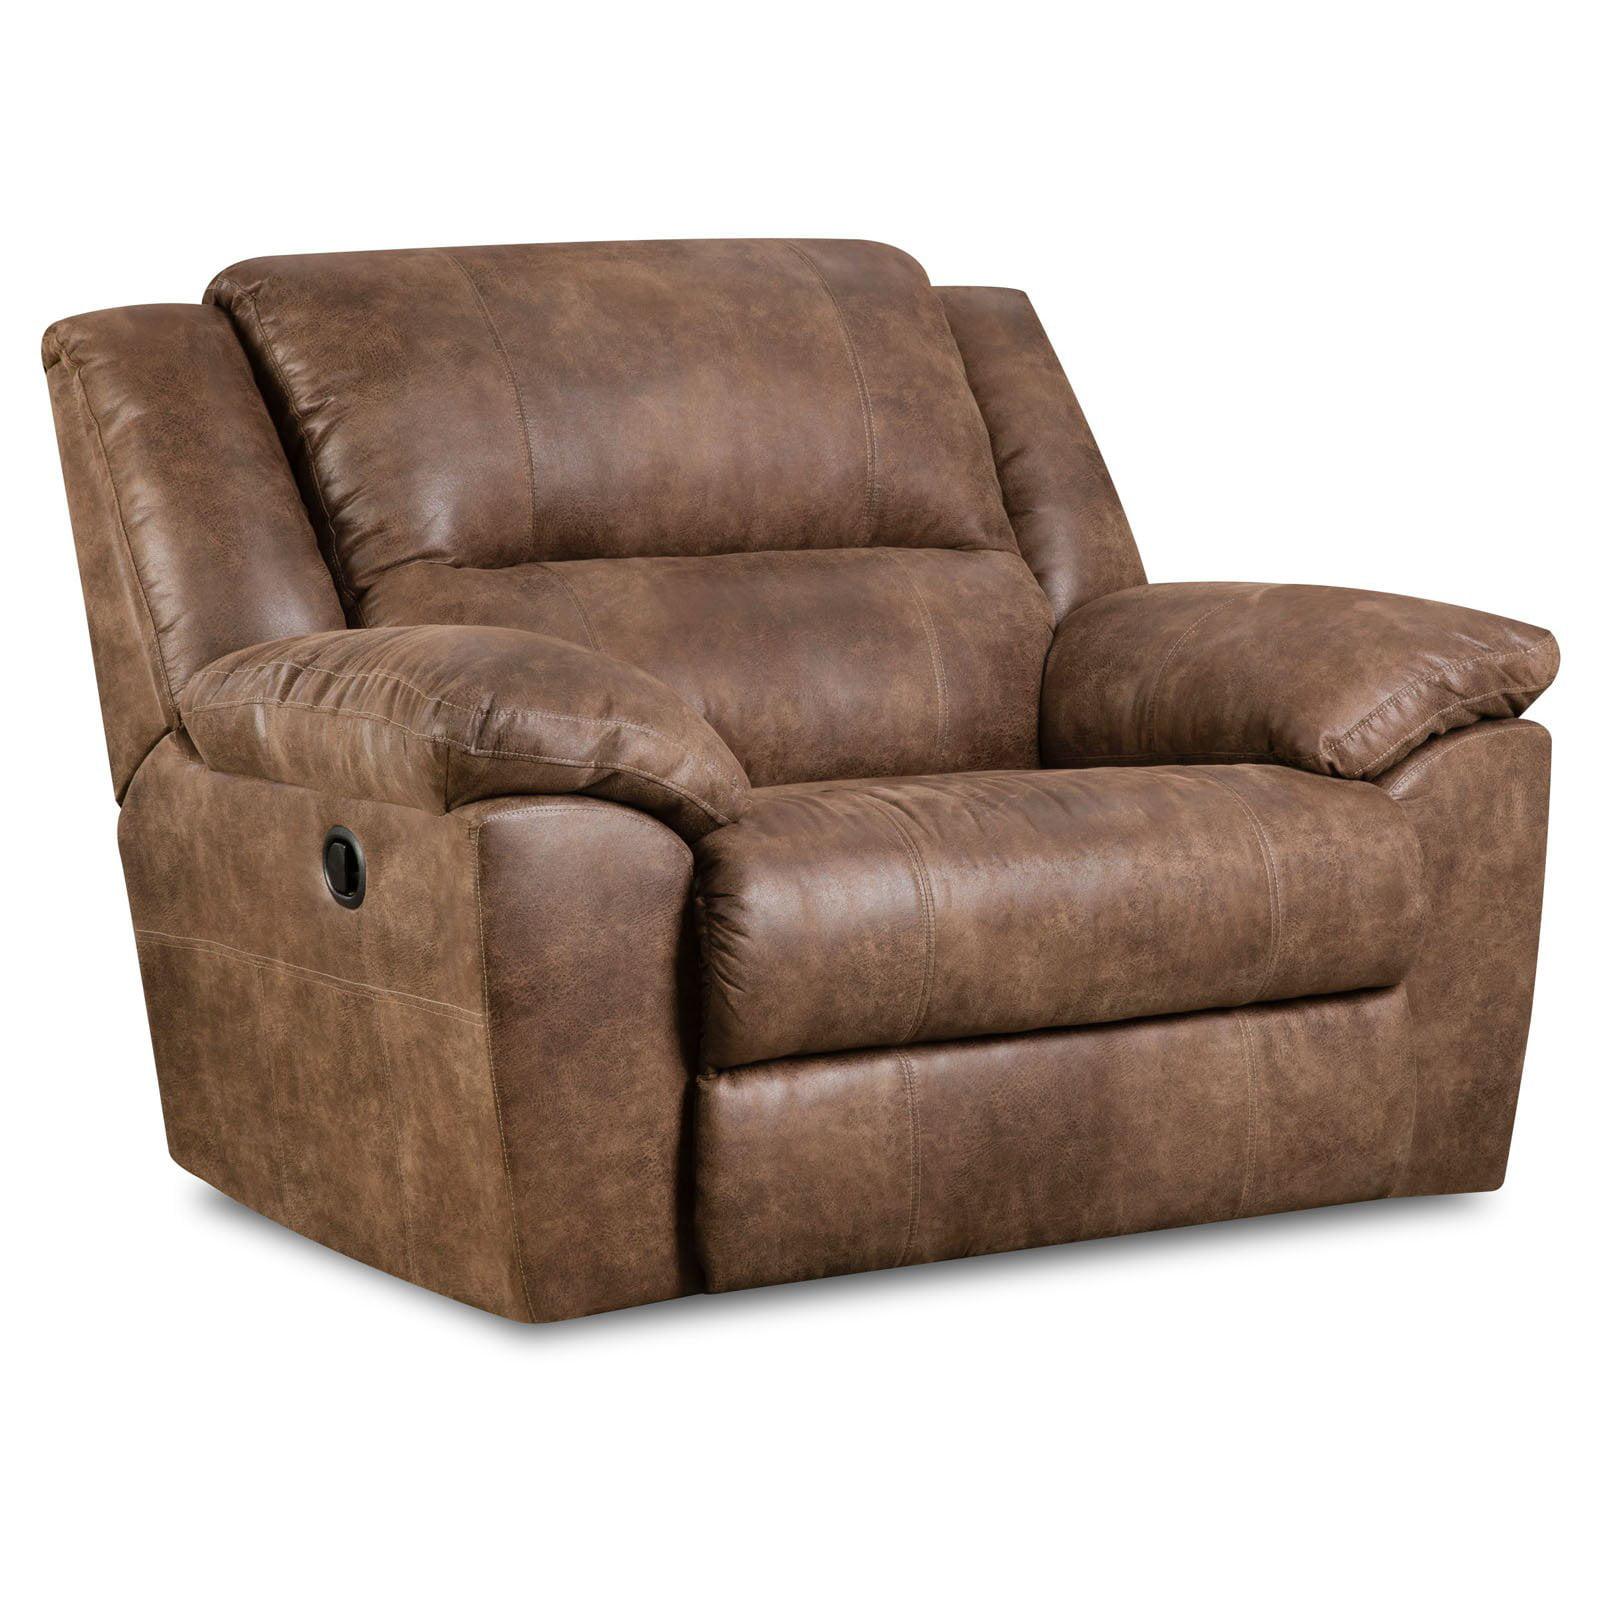 Simmons Upholstery Phoenix Cuddler Recliner   Mocha   Walmart.com